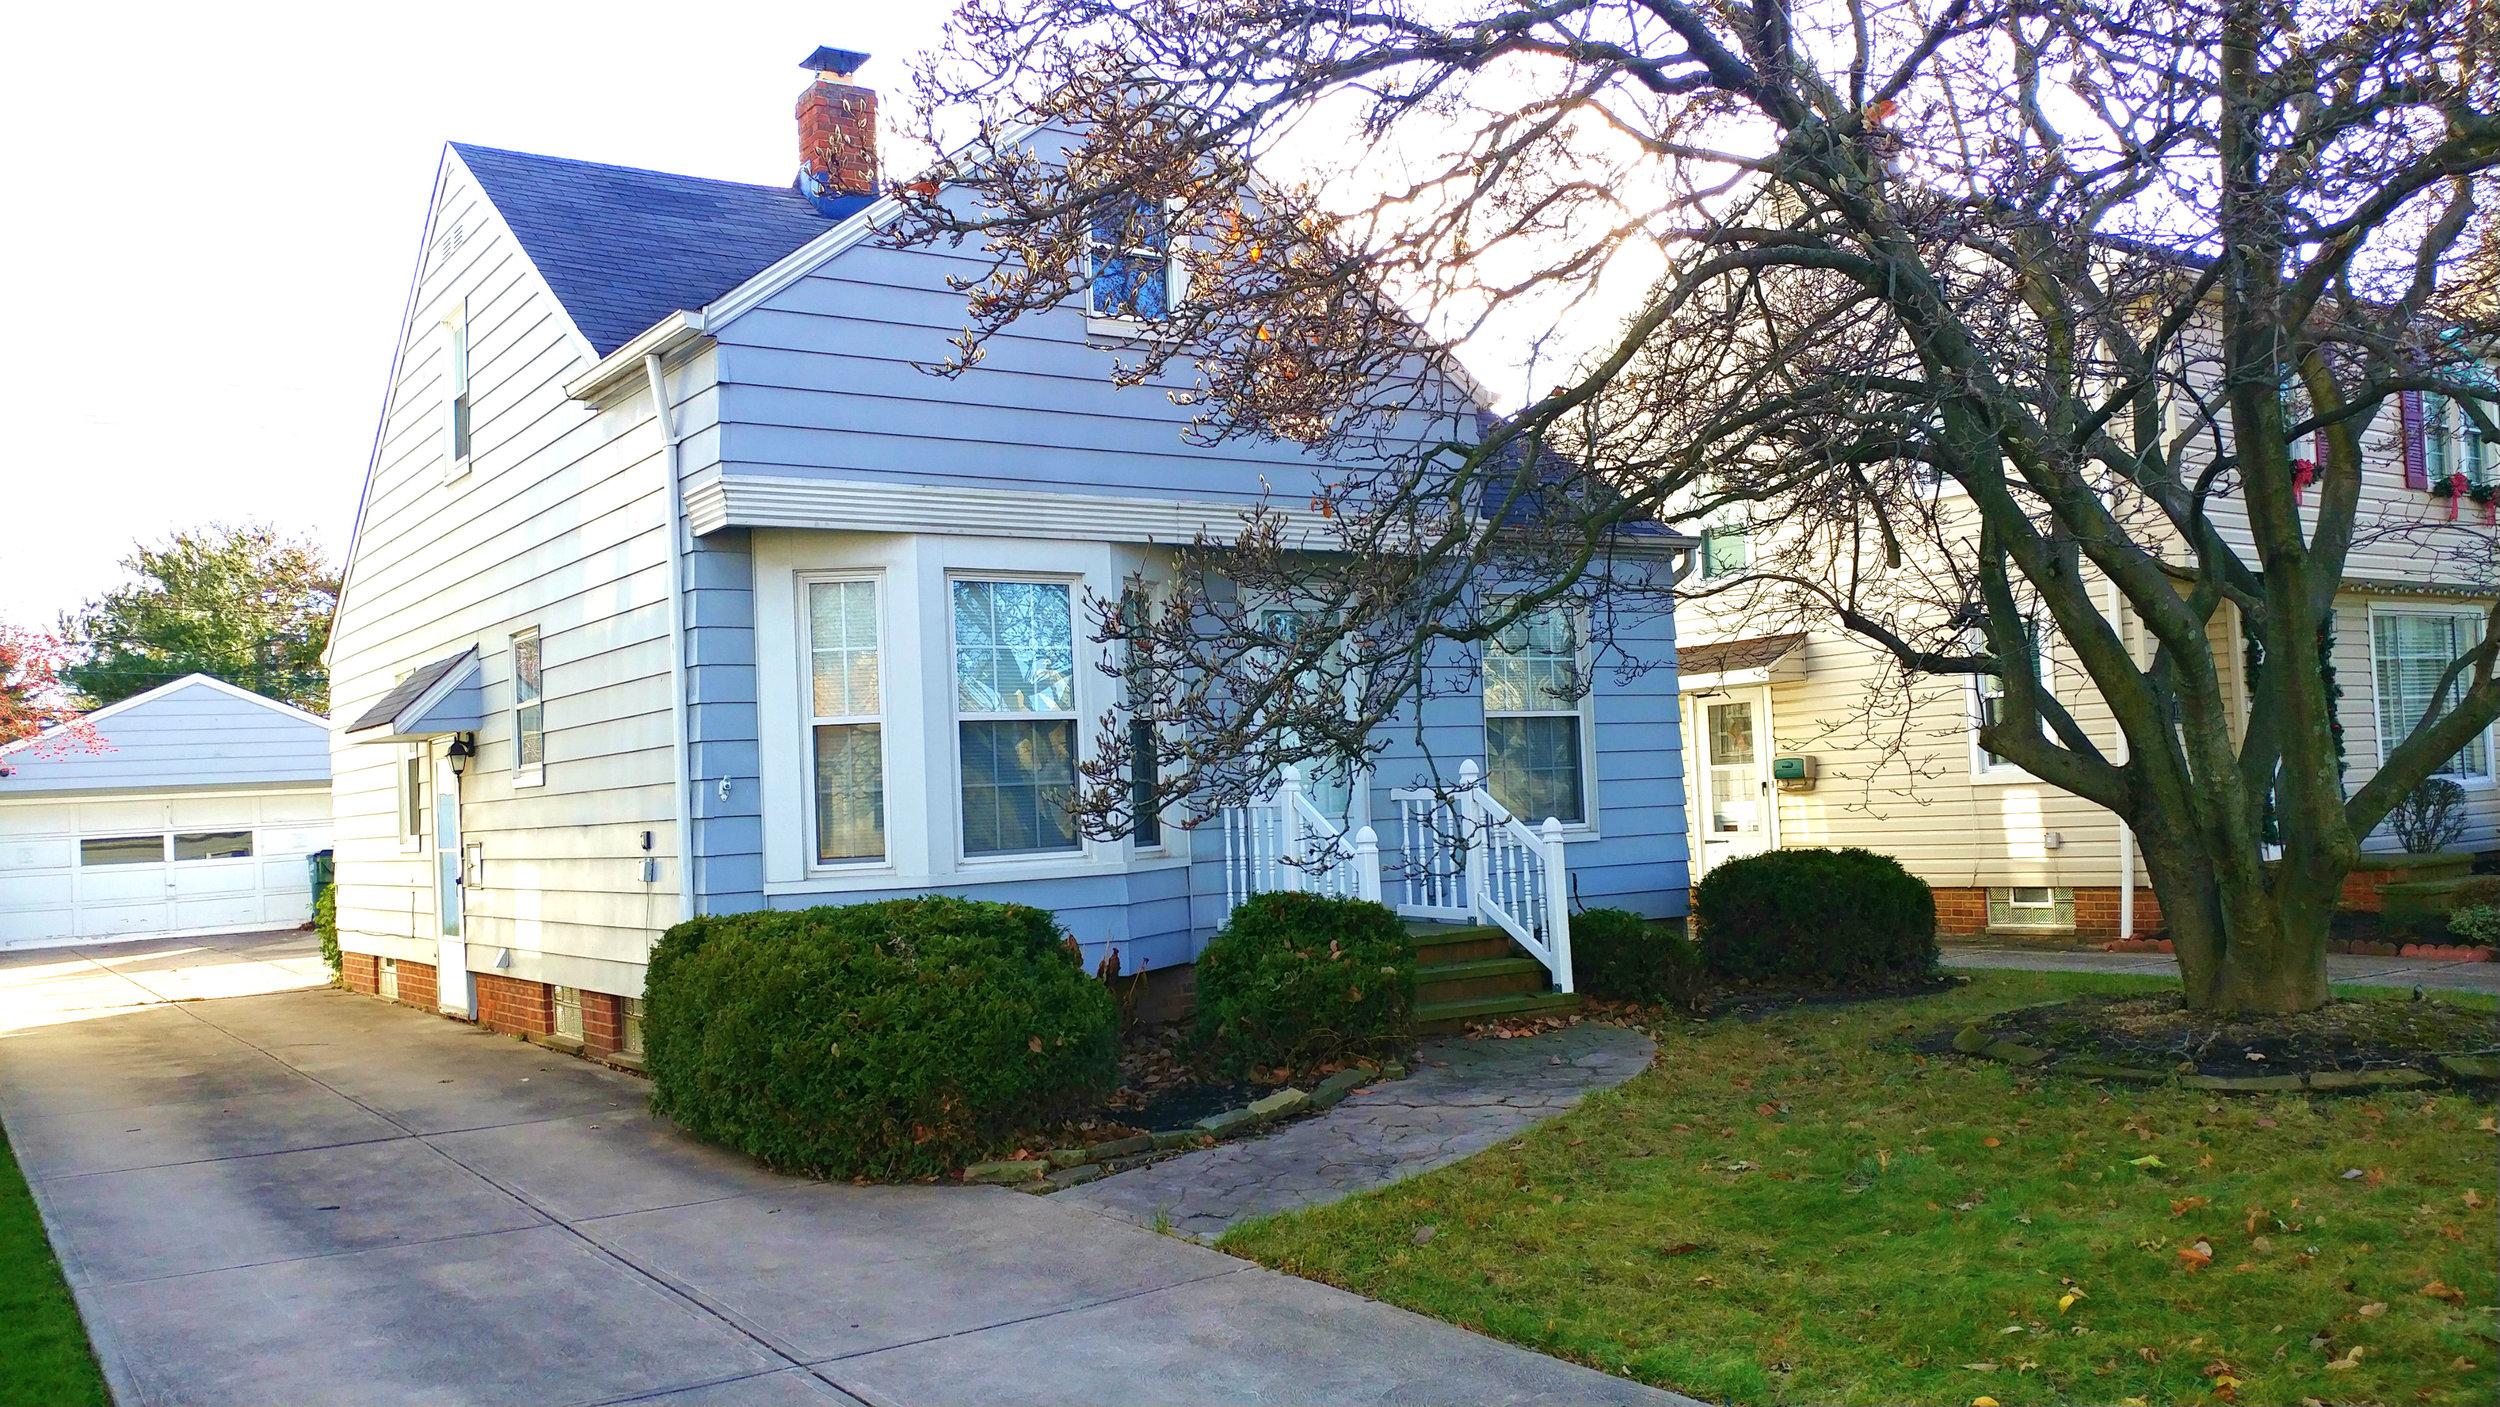 12924 Carpenter Rd., Garfield Hts. | 4 bed 2 bath | 1,635 Sq. Ft. | $70,000